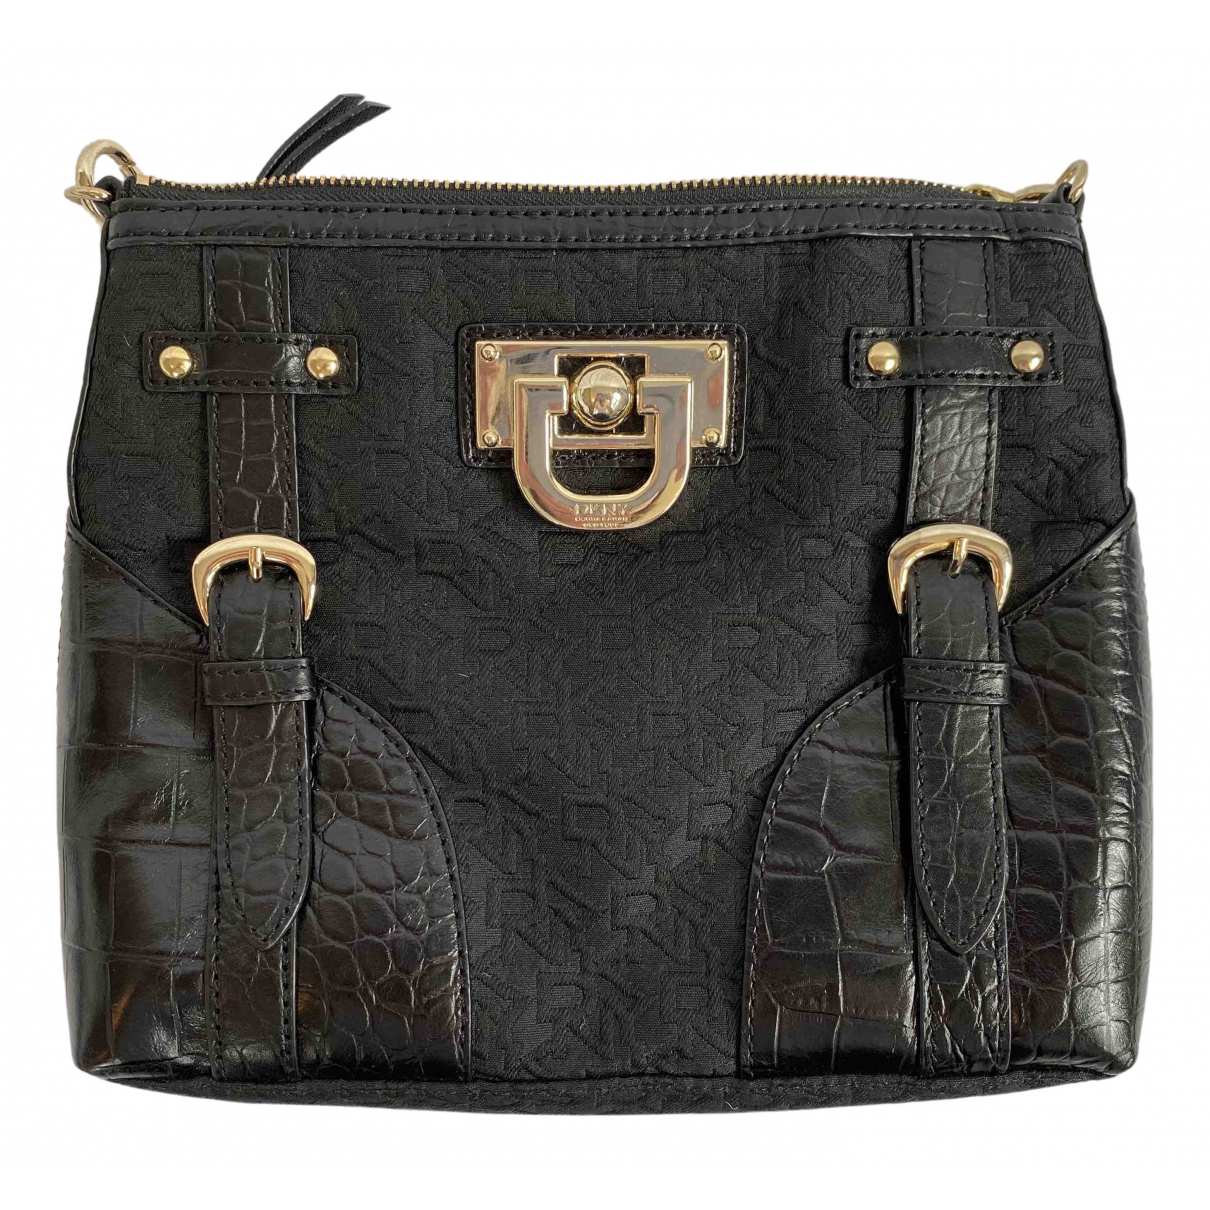 Dkny \N Black Cloth handbag for Women \N